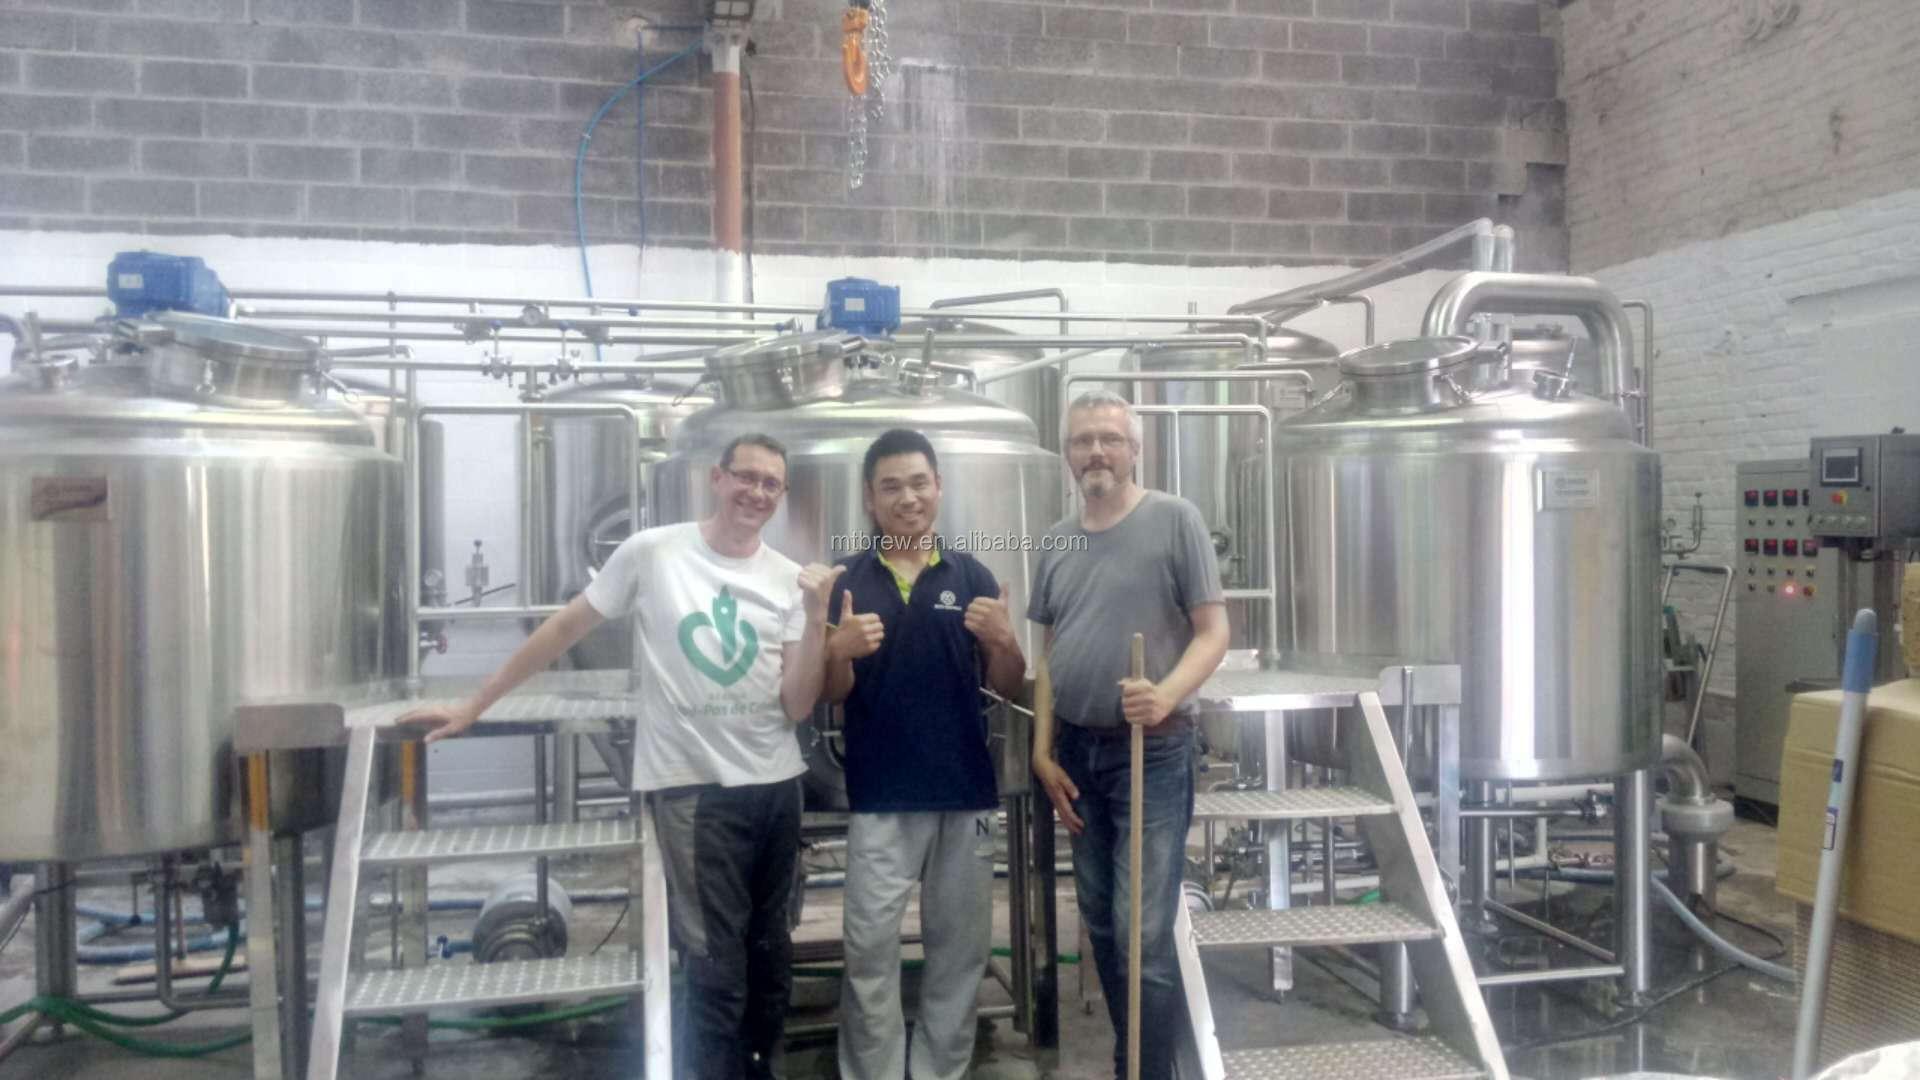 UK wholesale 500L Turkney Mash tun/Lauter tank Boil Kettle/Whirlpool tank HWT fermenters craft beer brewing equipment